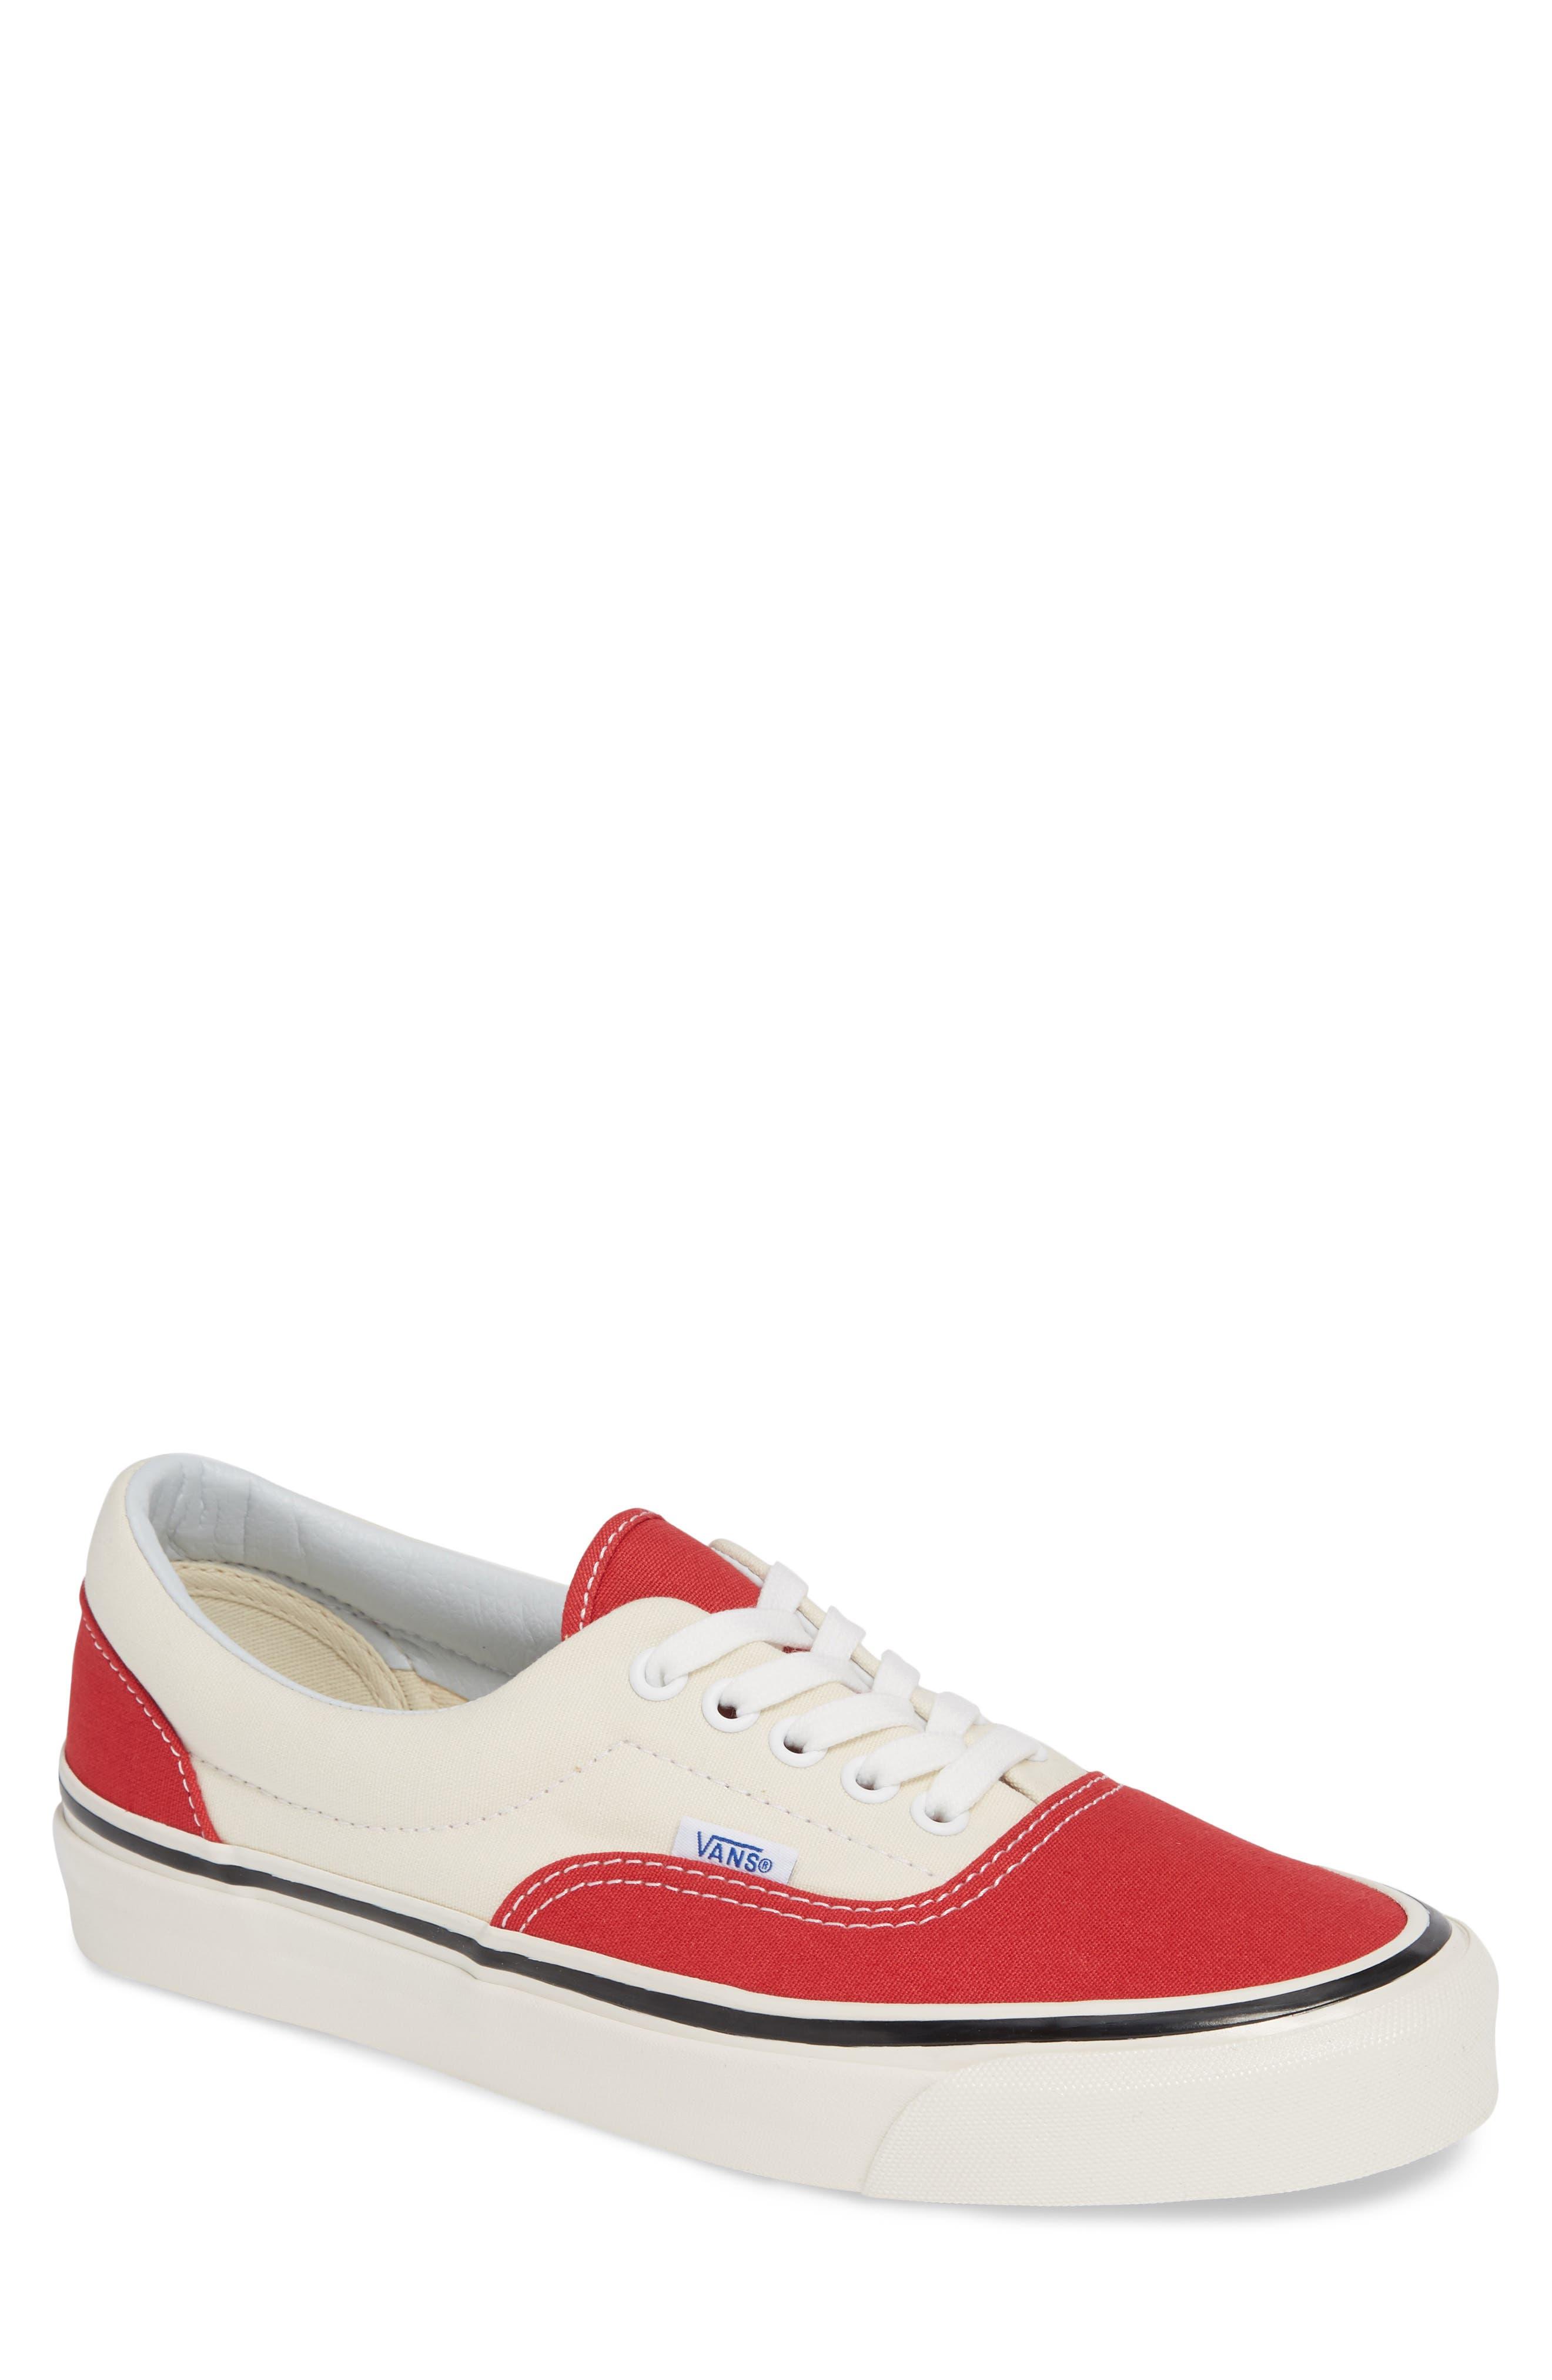 Anaheim Factory Era 95 DX Sneaker,                         Main,                         color, OG RED/ OG WHITE CANVAS